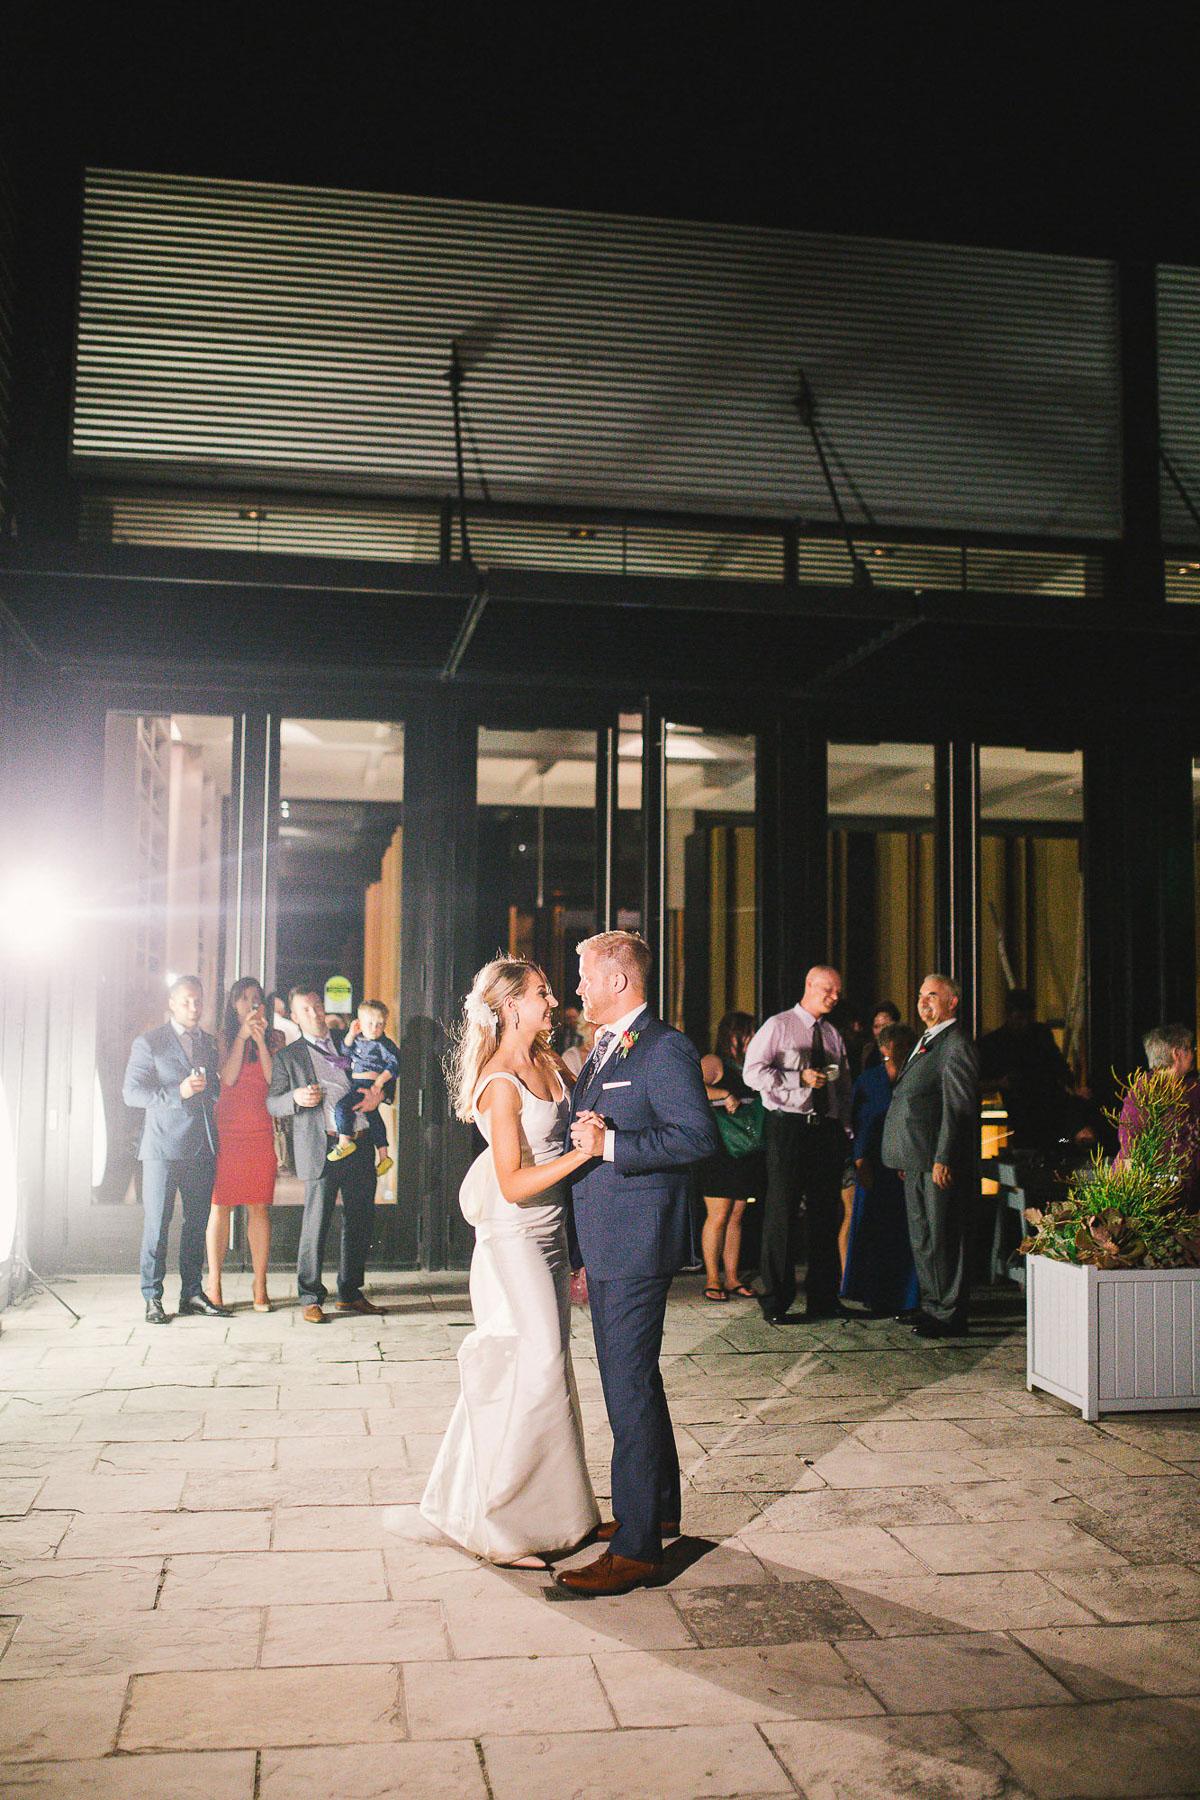 julia-park-photography-vineyard-bride-swish-list-stratus-winery-niagara-on-the-lake-wedding-31.jpg